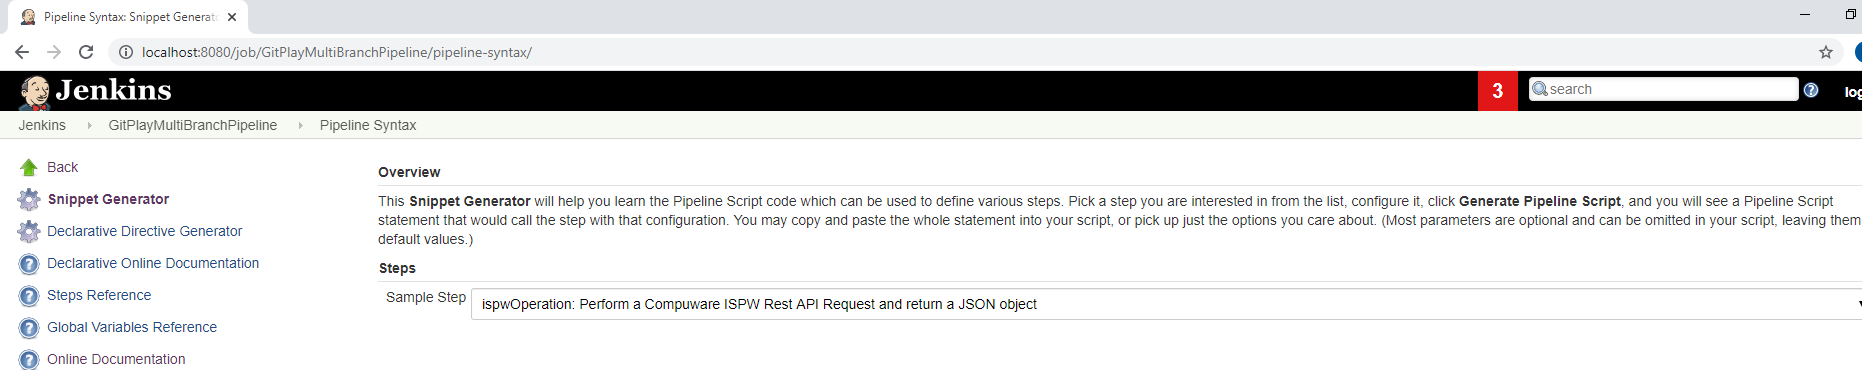 JenkinsSnippetGenerator3-BuildAssignment